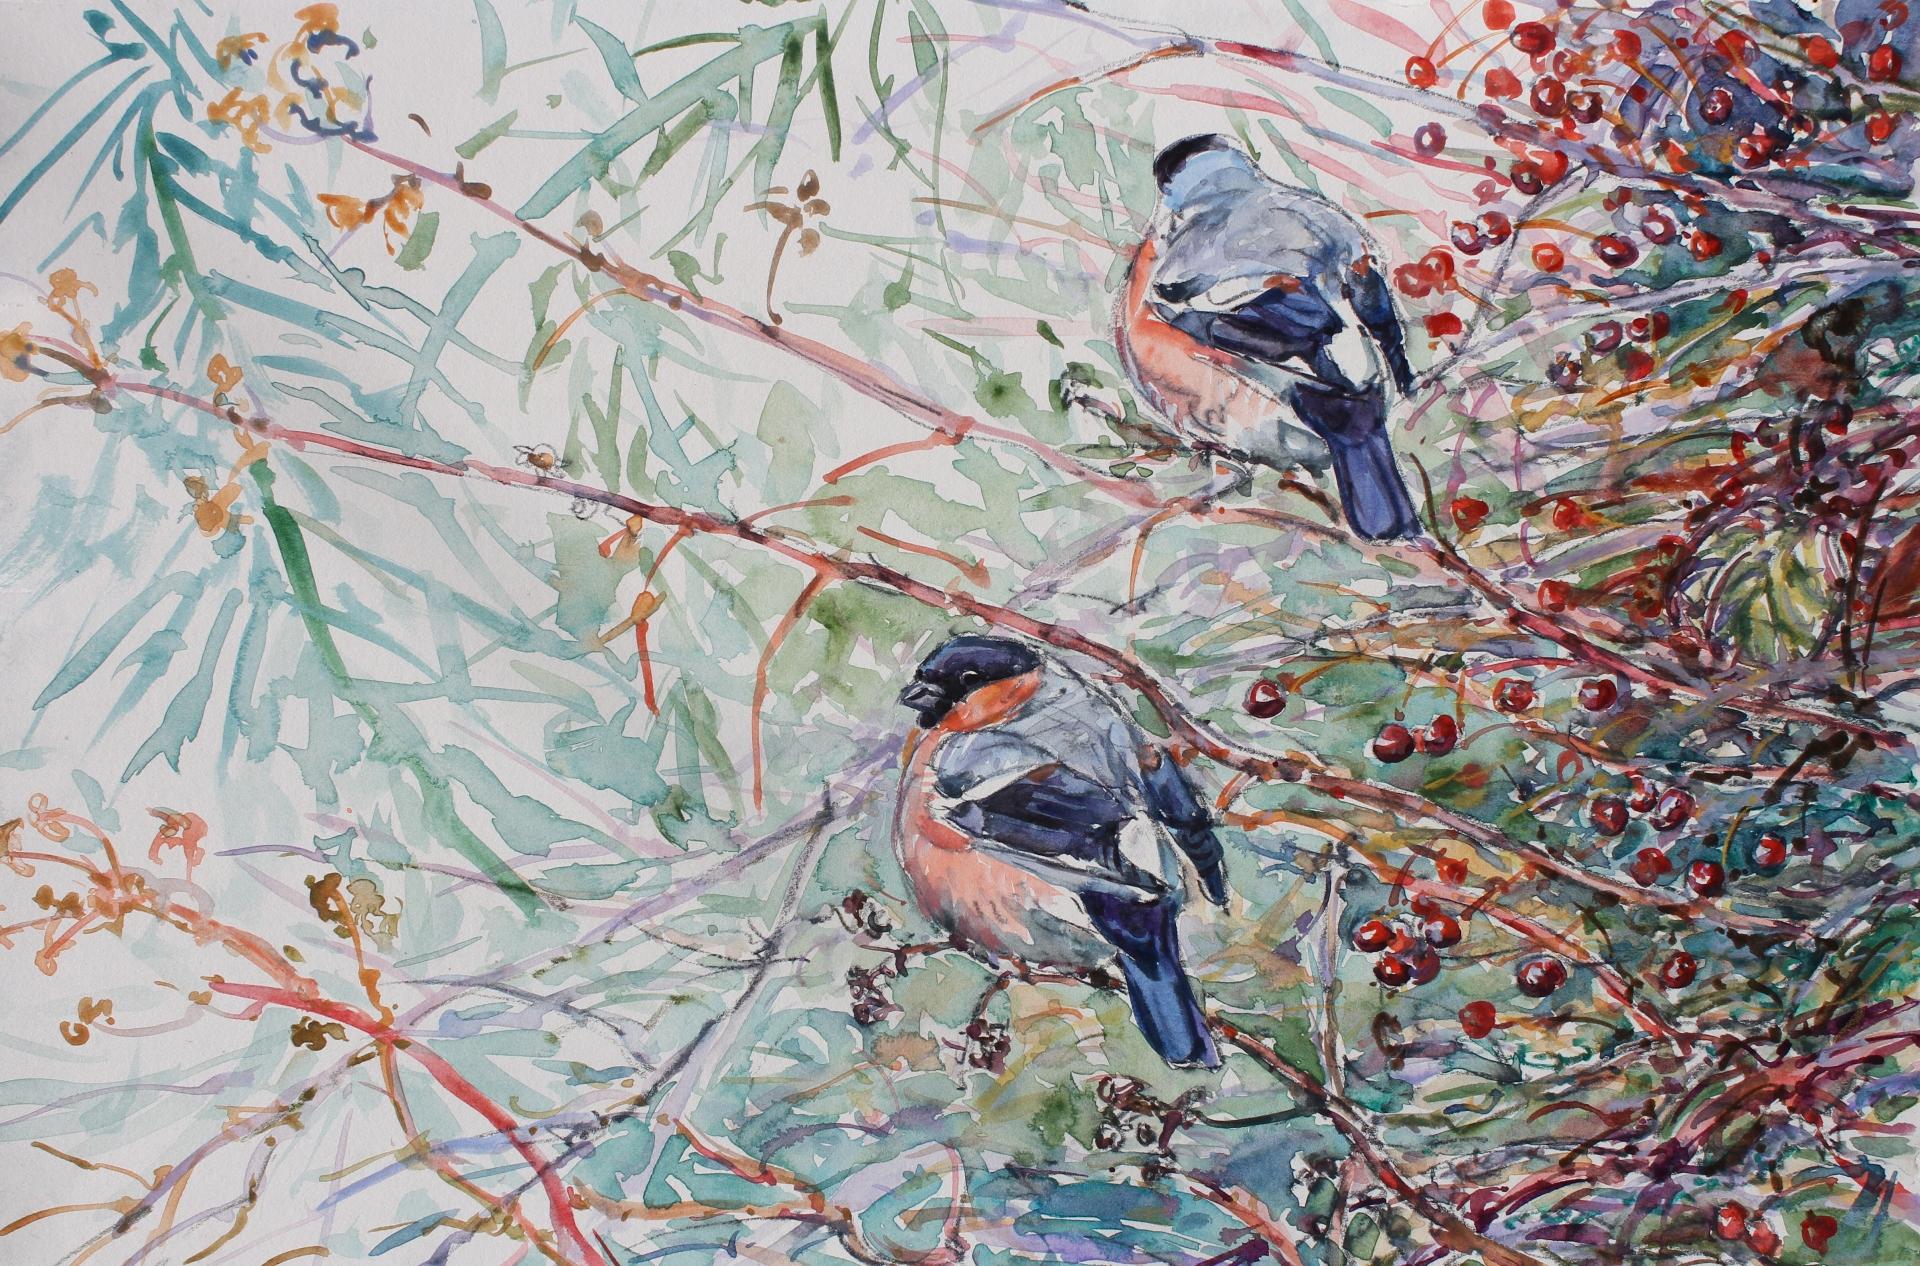 Bullfinchs and Hawthorne